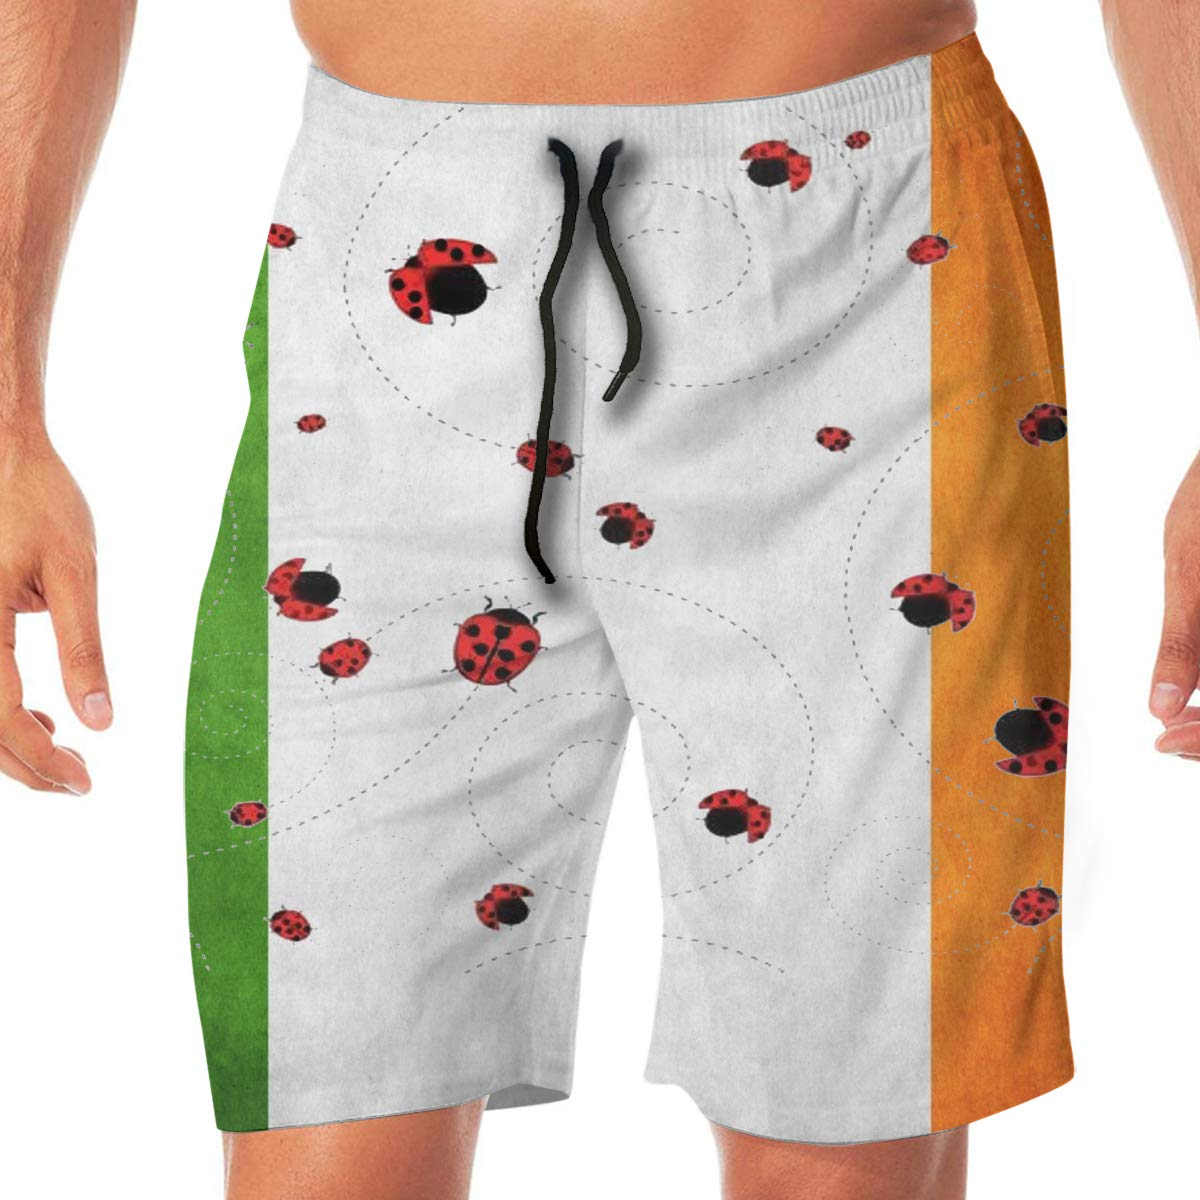 SEXTDSFD Ladybug Mens Running Casual Short Beach Pants Swim Trunks Drawstring Board Shorts Swimwear